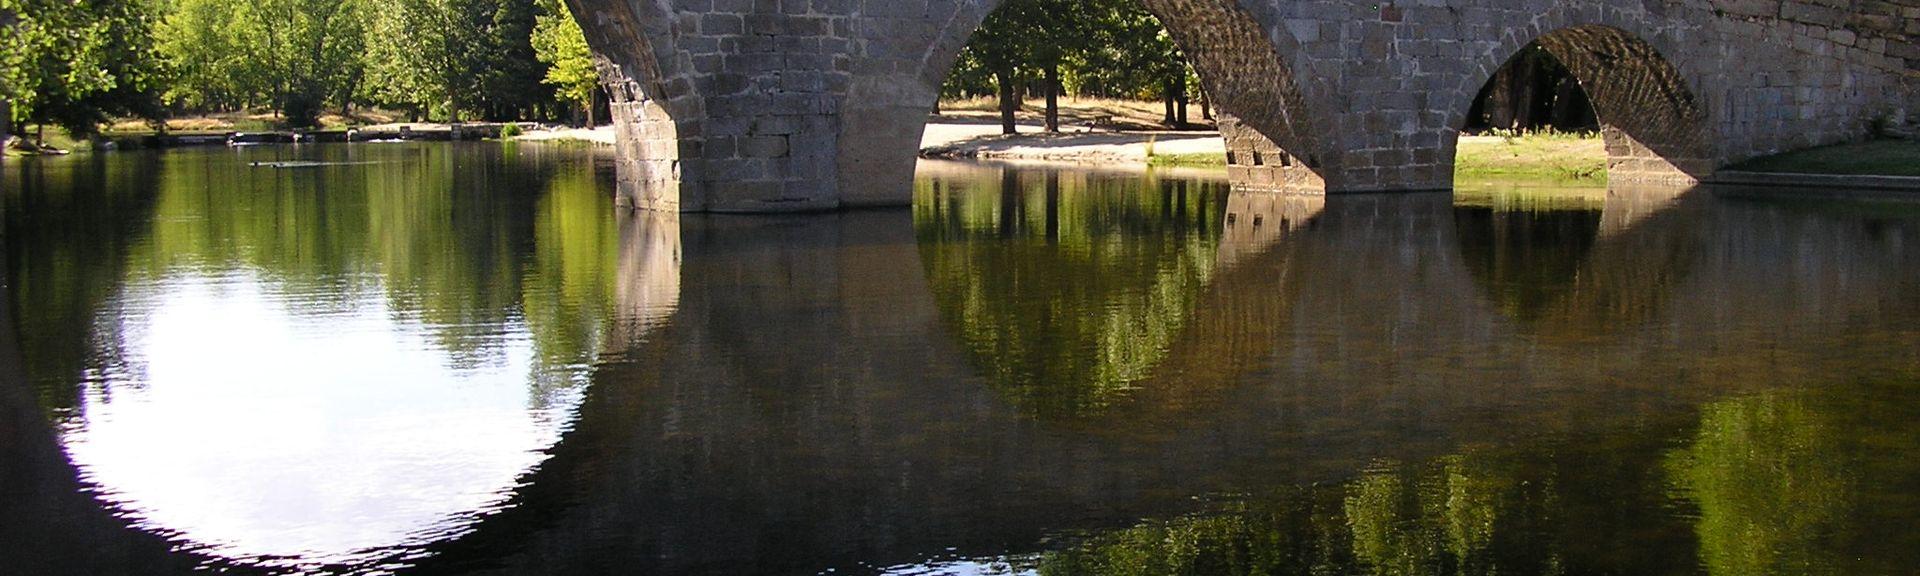 Burgohondo, Castile and Leon, Spain